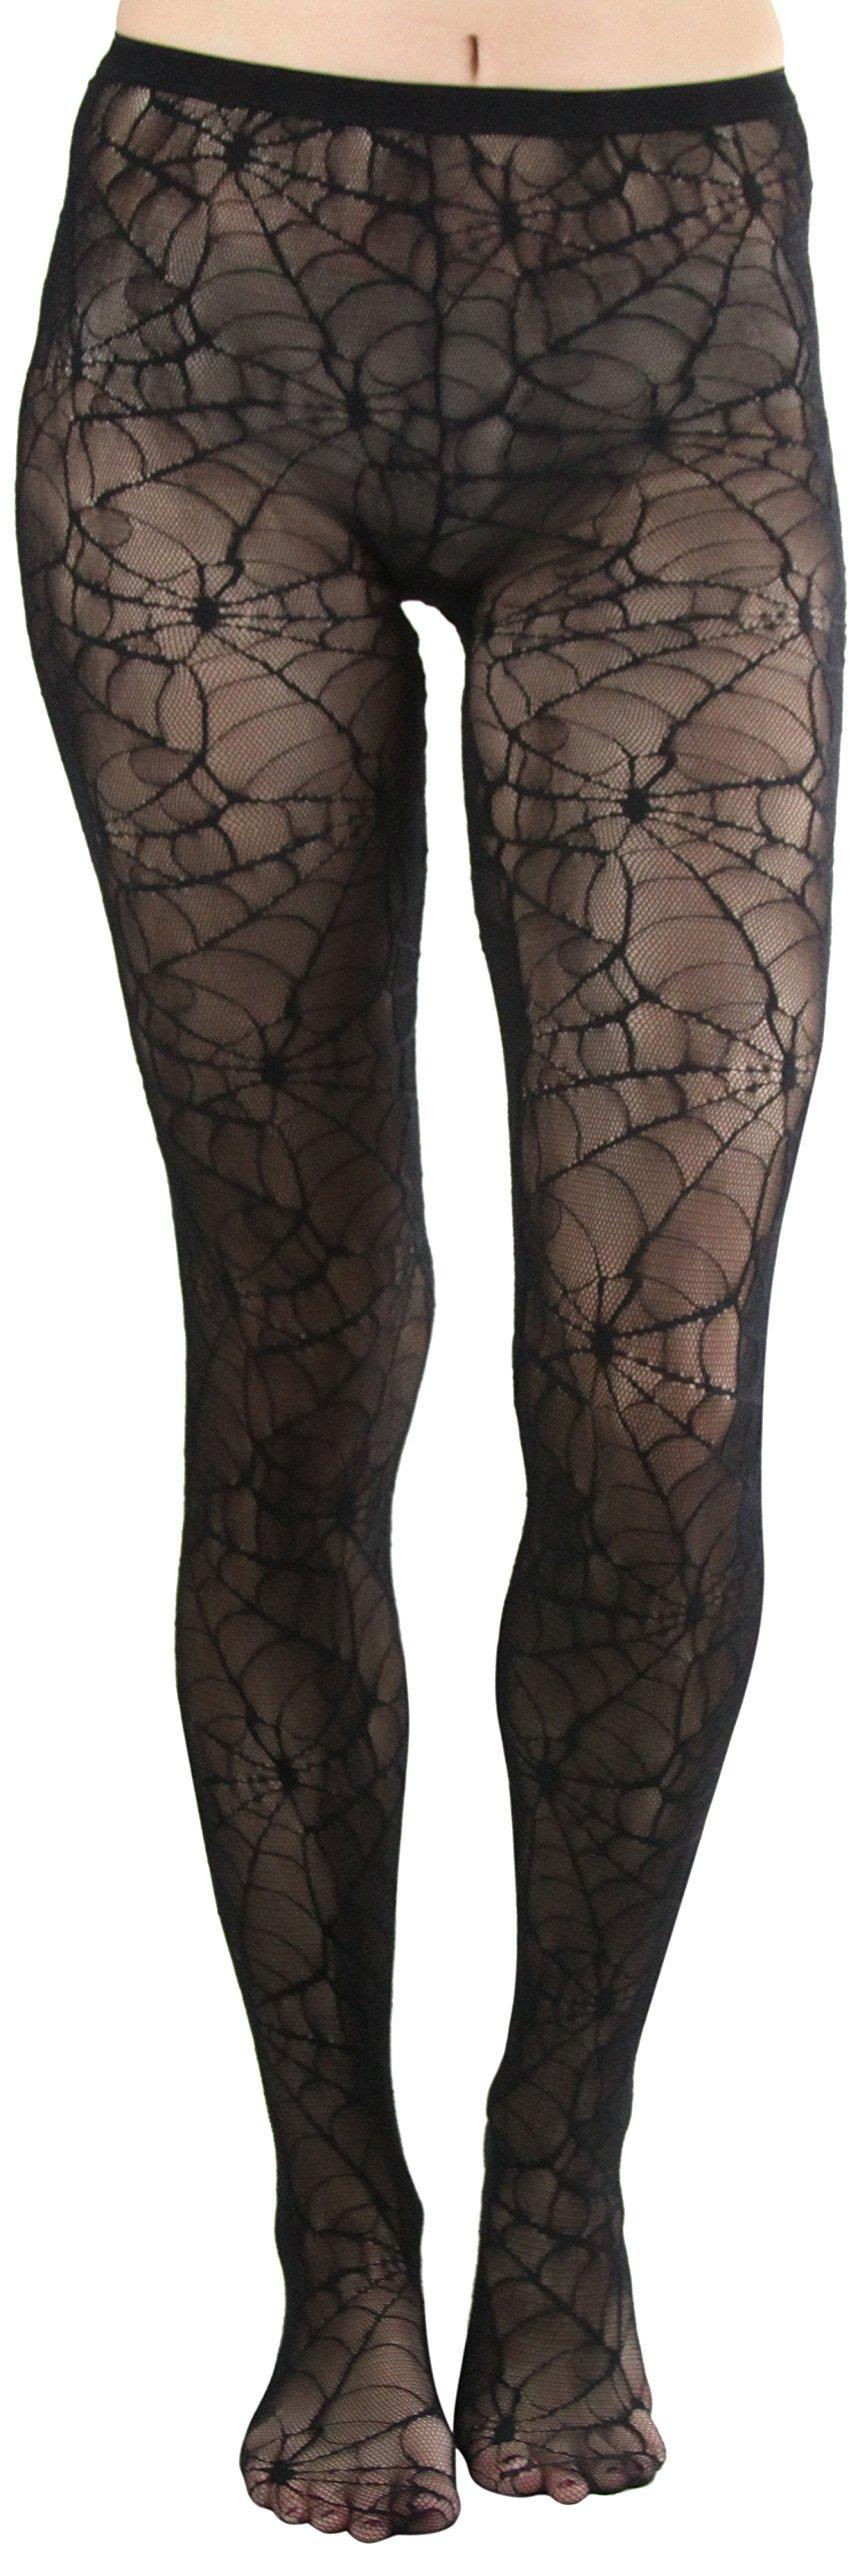 ToBeInStyle Women's Spider Web Pantyhose - BLACK, One Size Regular